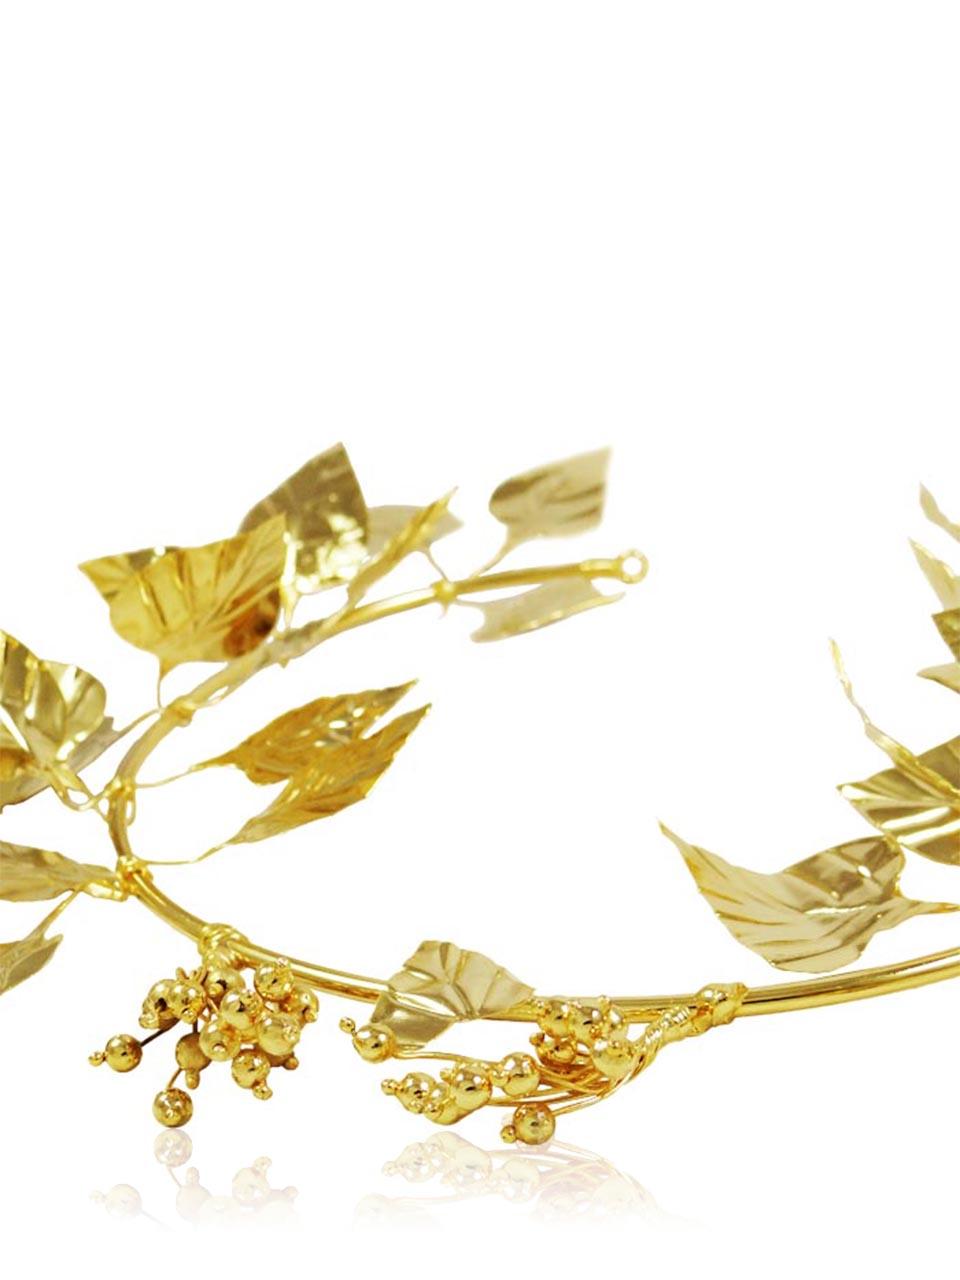 Ivy Wreath, Gold.